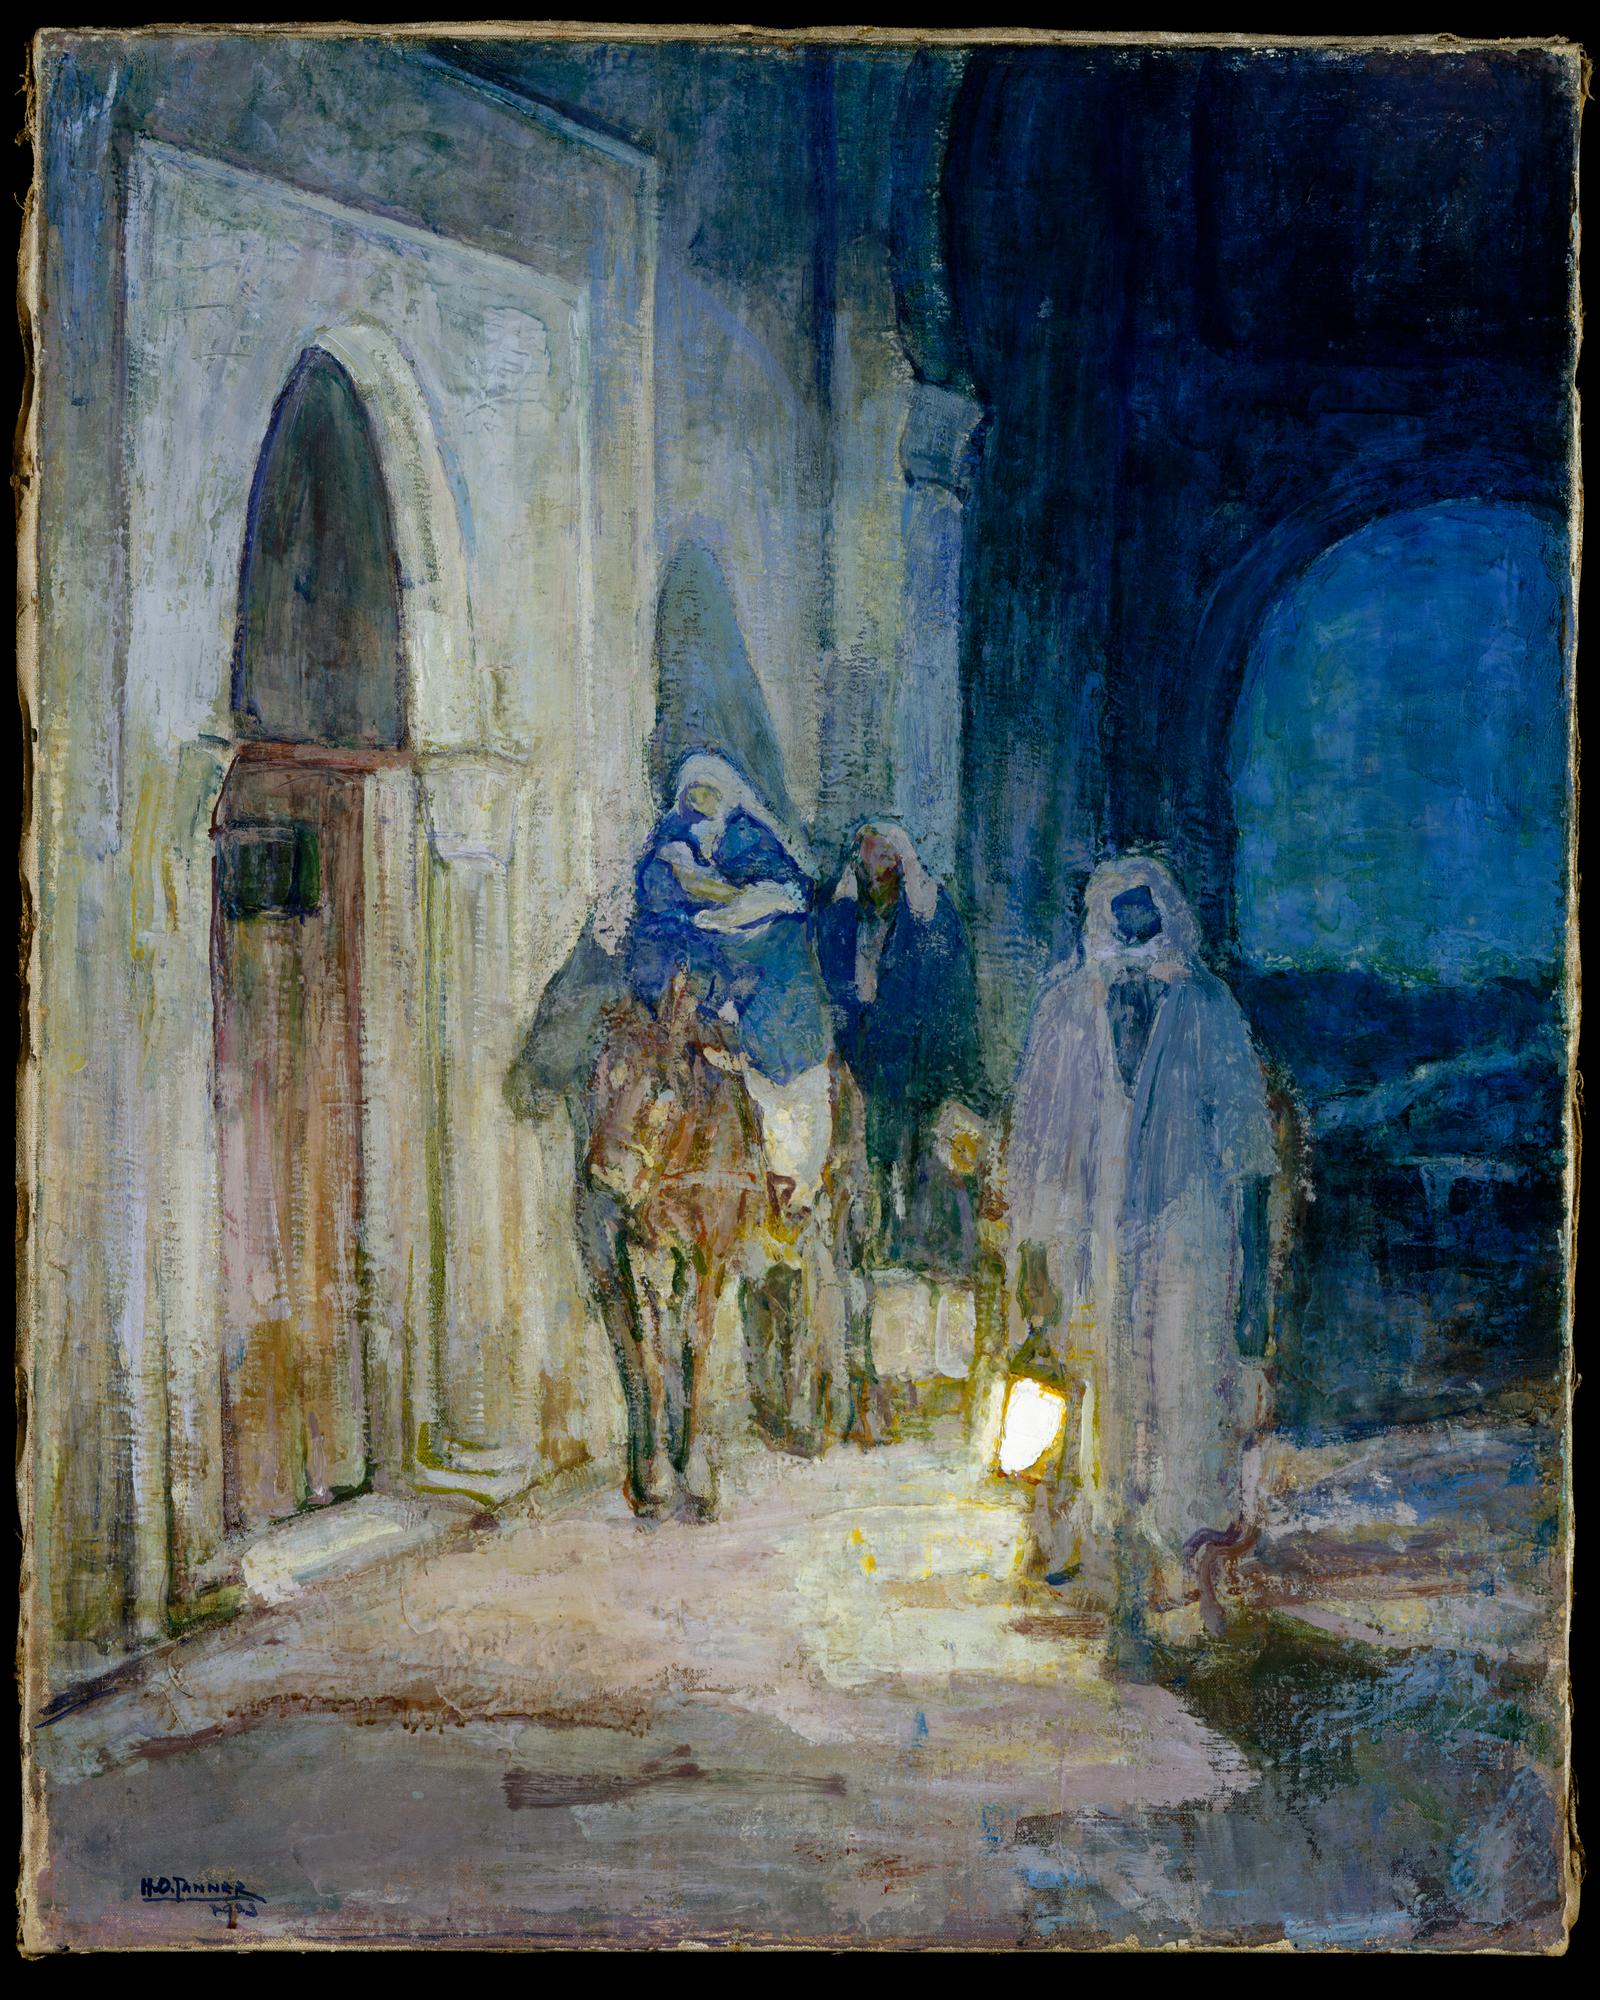 Flight into Egypt, 1923 by Henry Ossawa Tanner